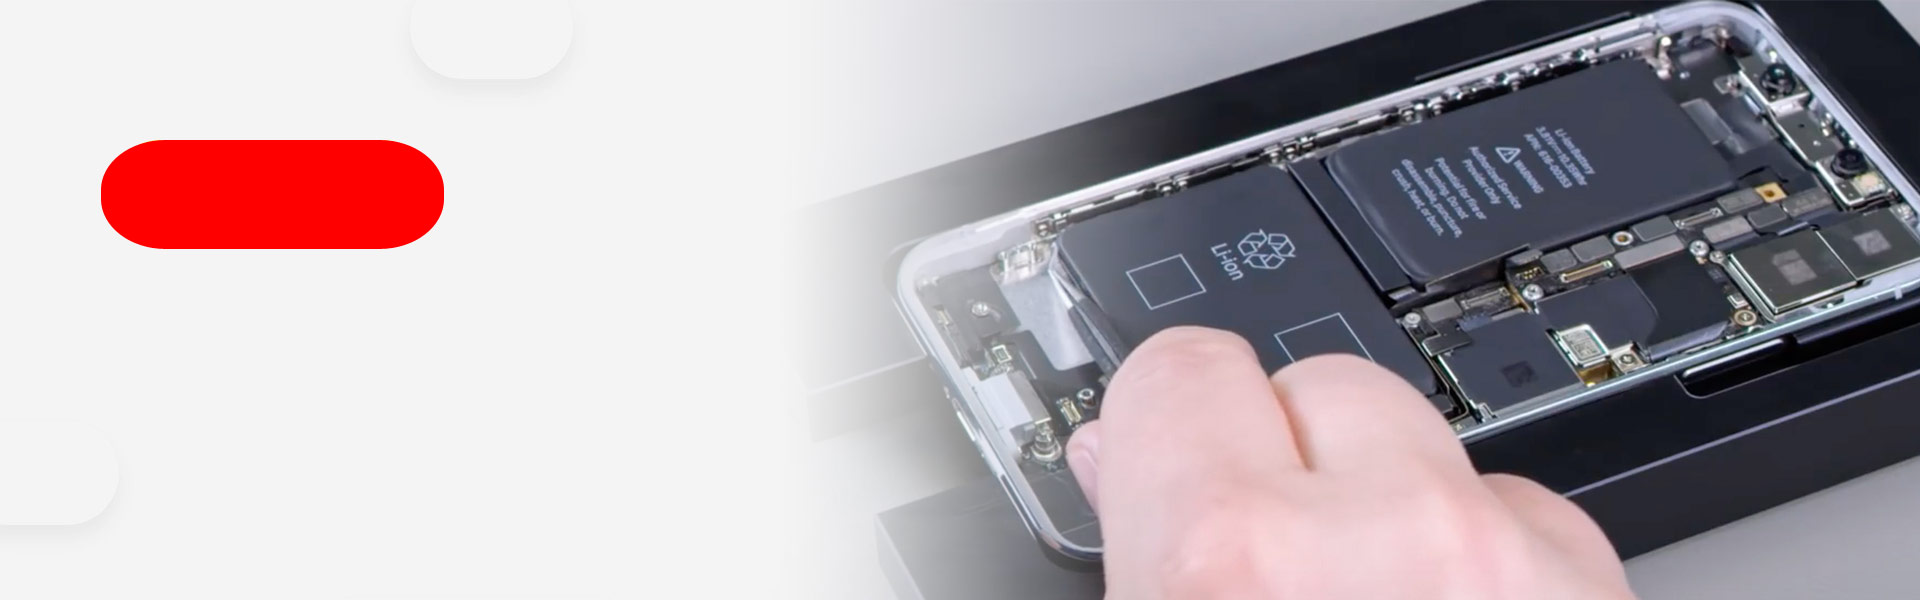 Fix Phone Tablet Services